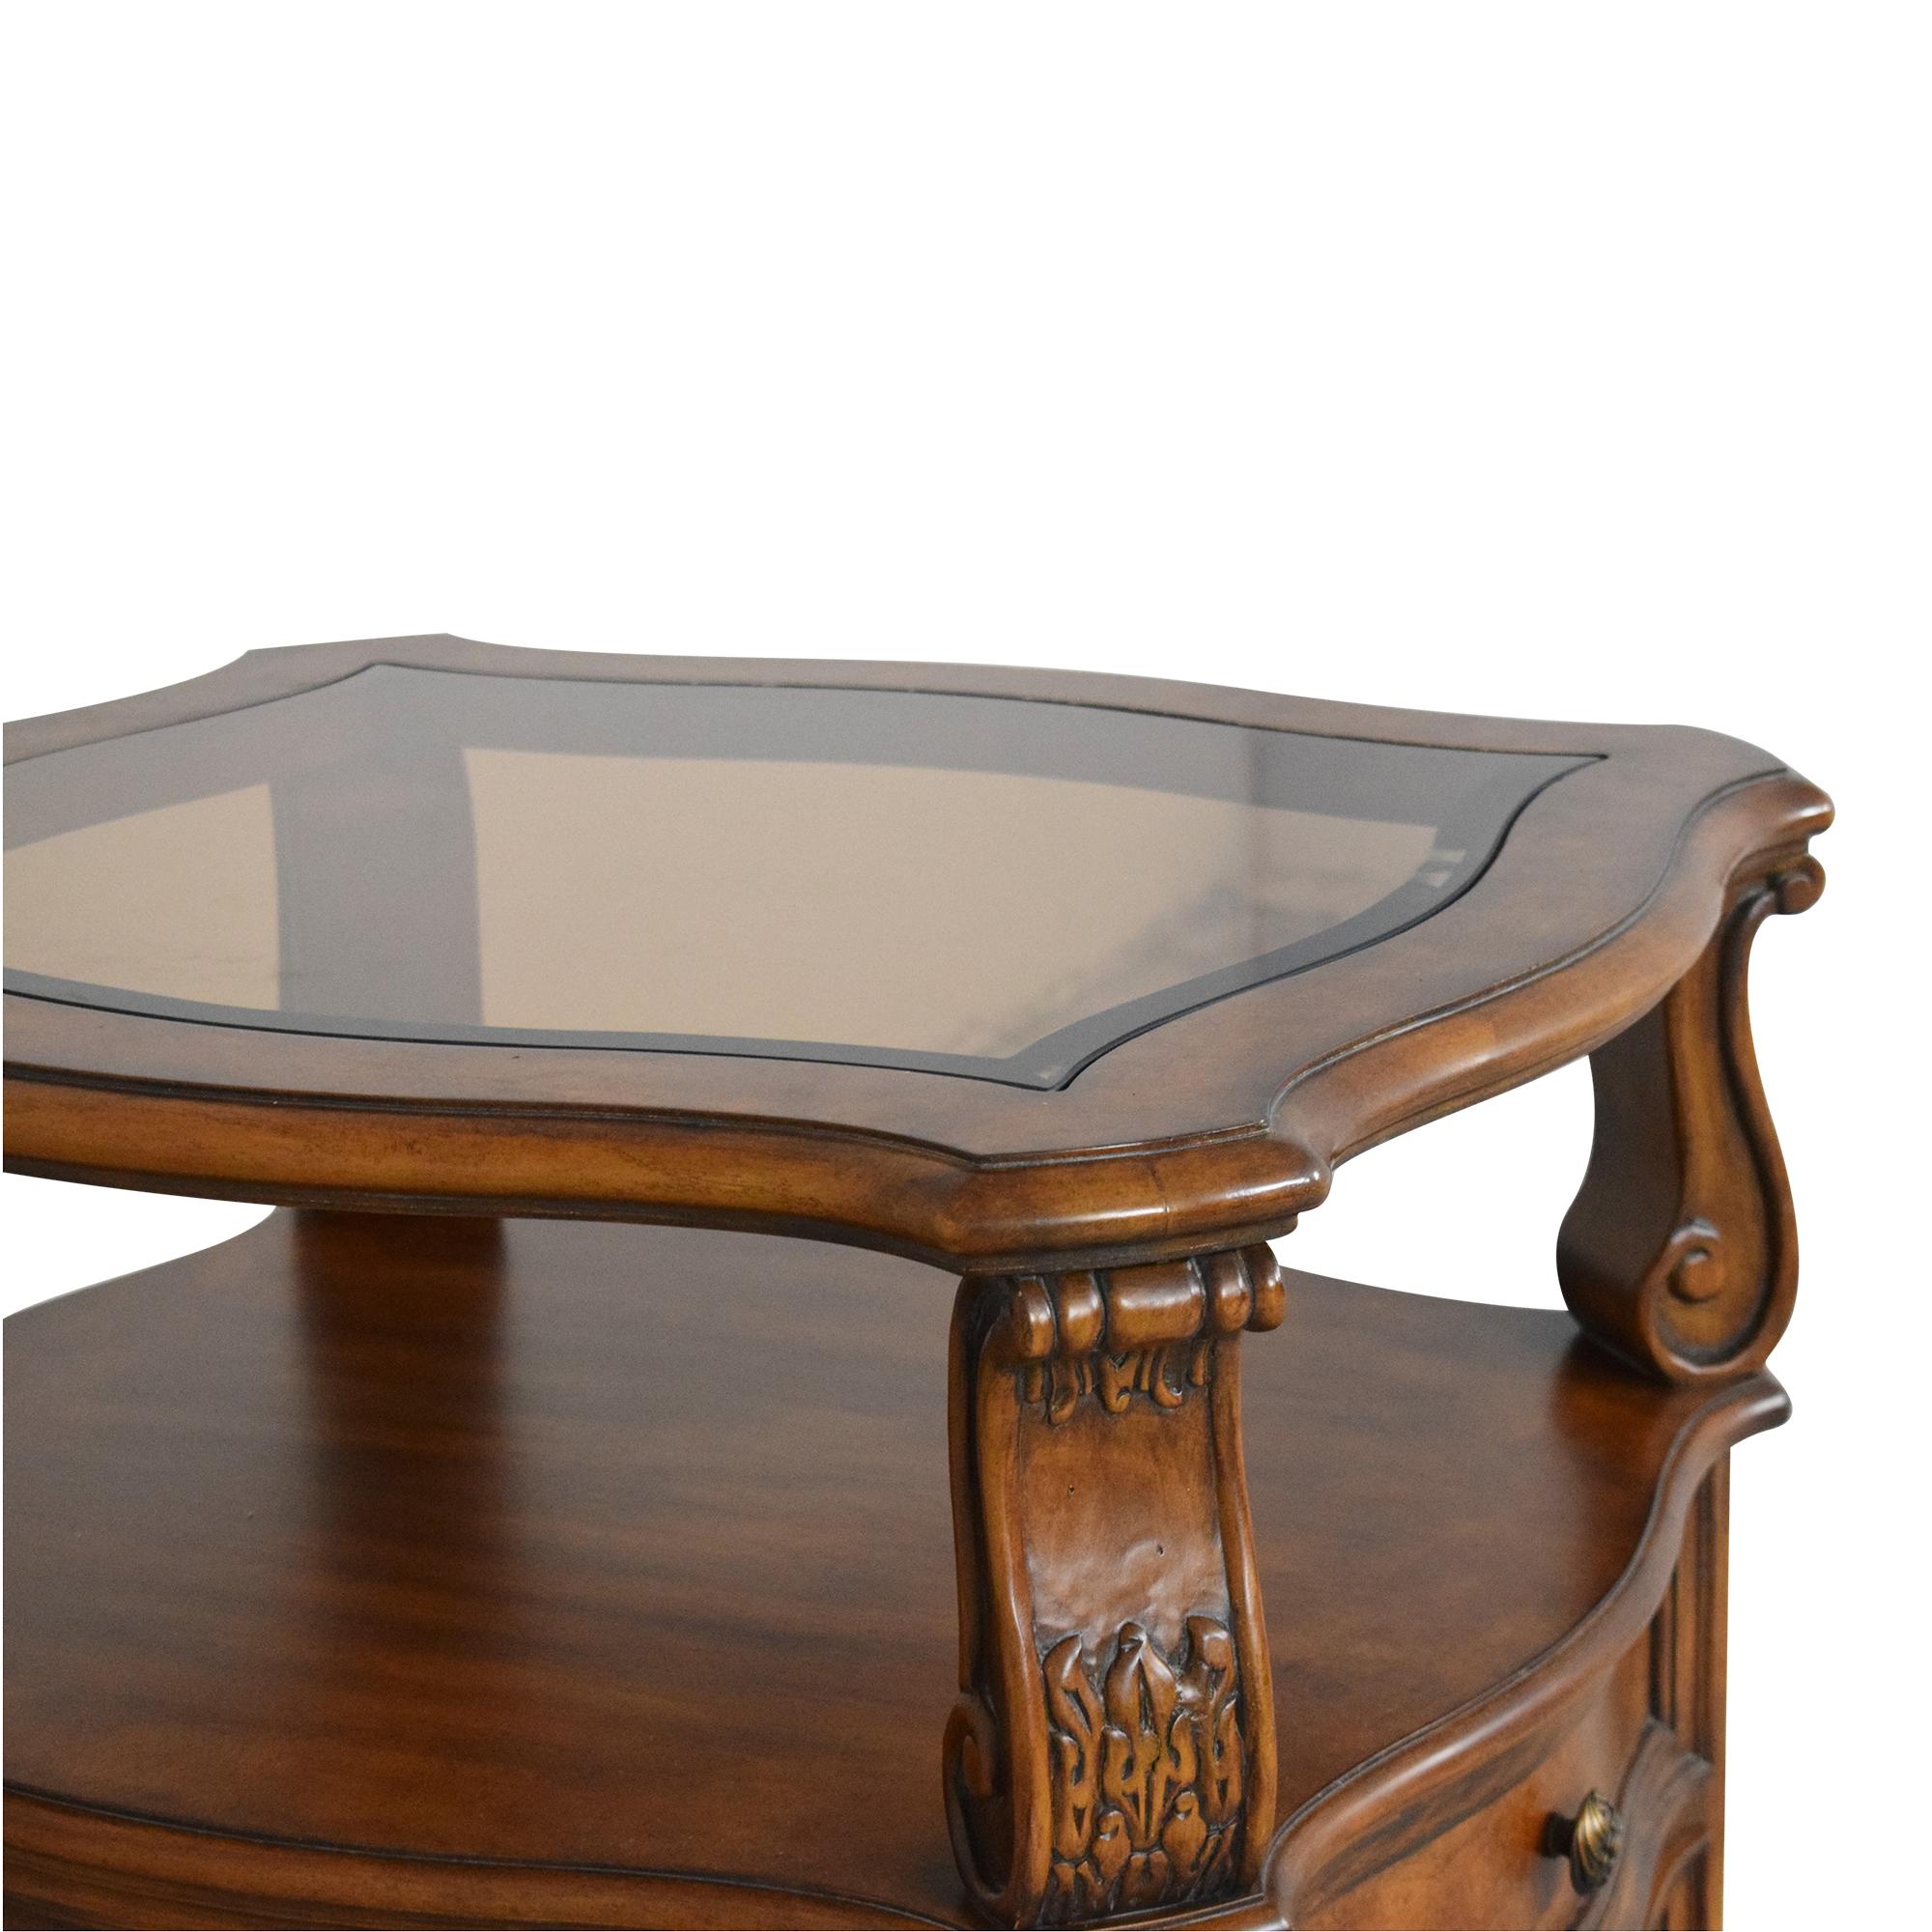 Drexel Heritage Drexel Heritage Carved Nightstand Tables